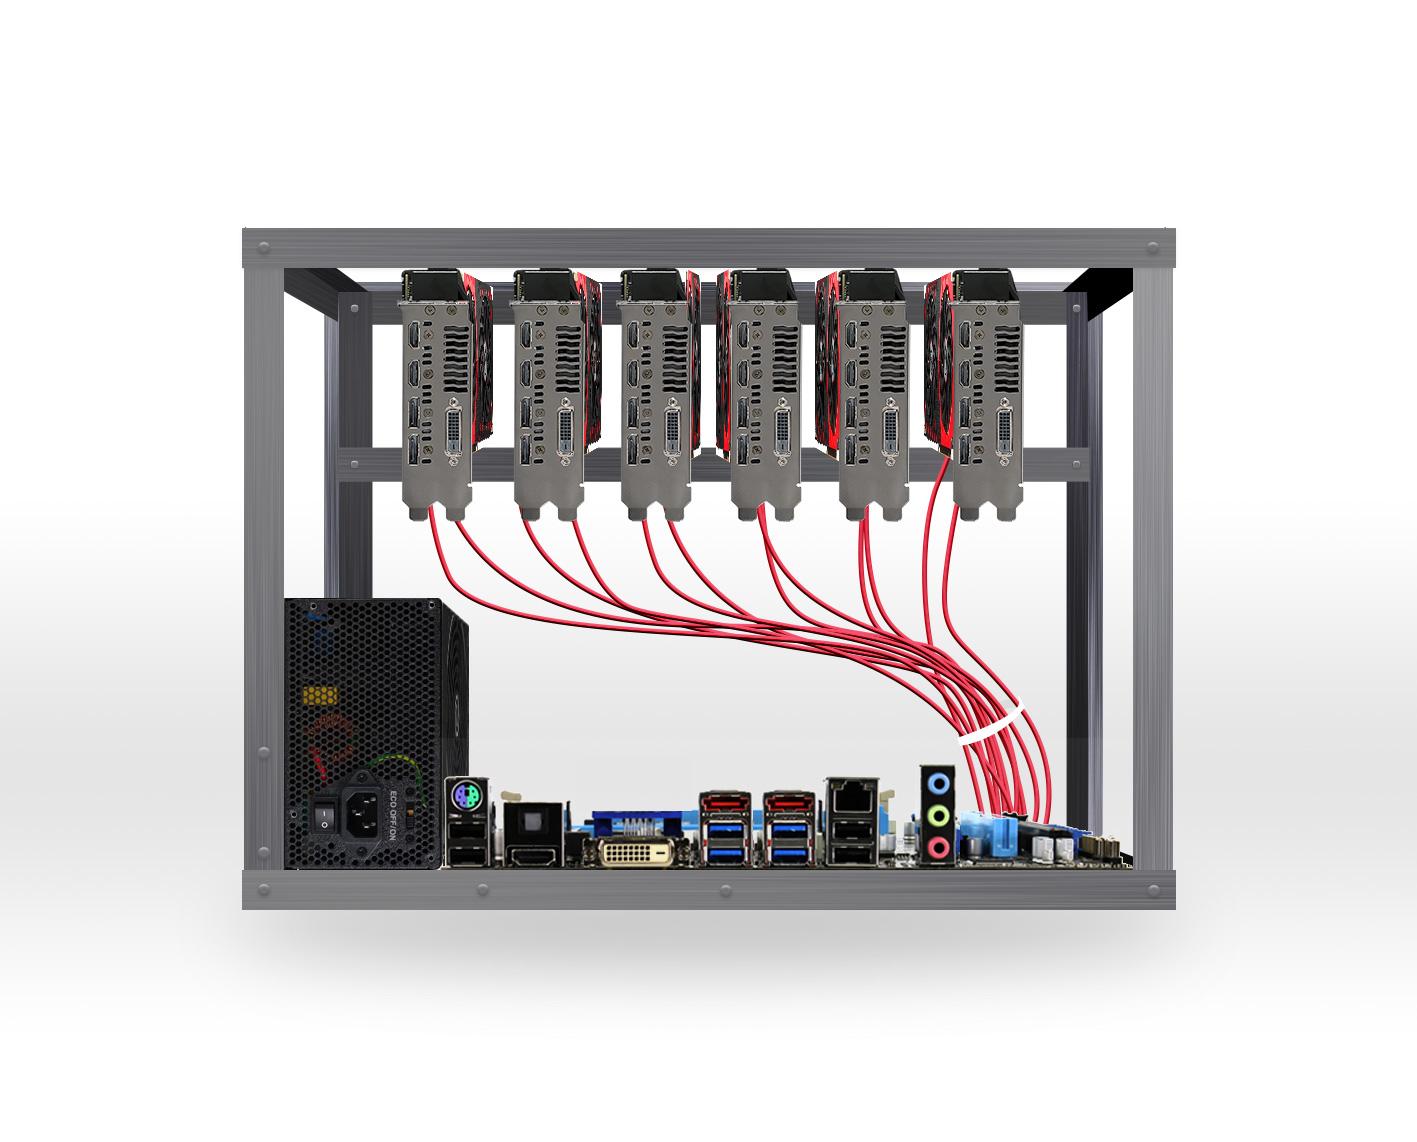 AMD/XFX BC-160 क्रिप्टो GPU को छेड़ा गया: 8GB HBM2, 150W, 72MH/s माइनिंग ETH